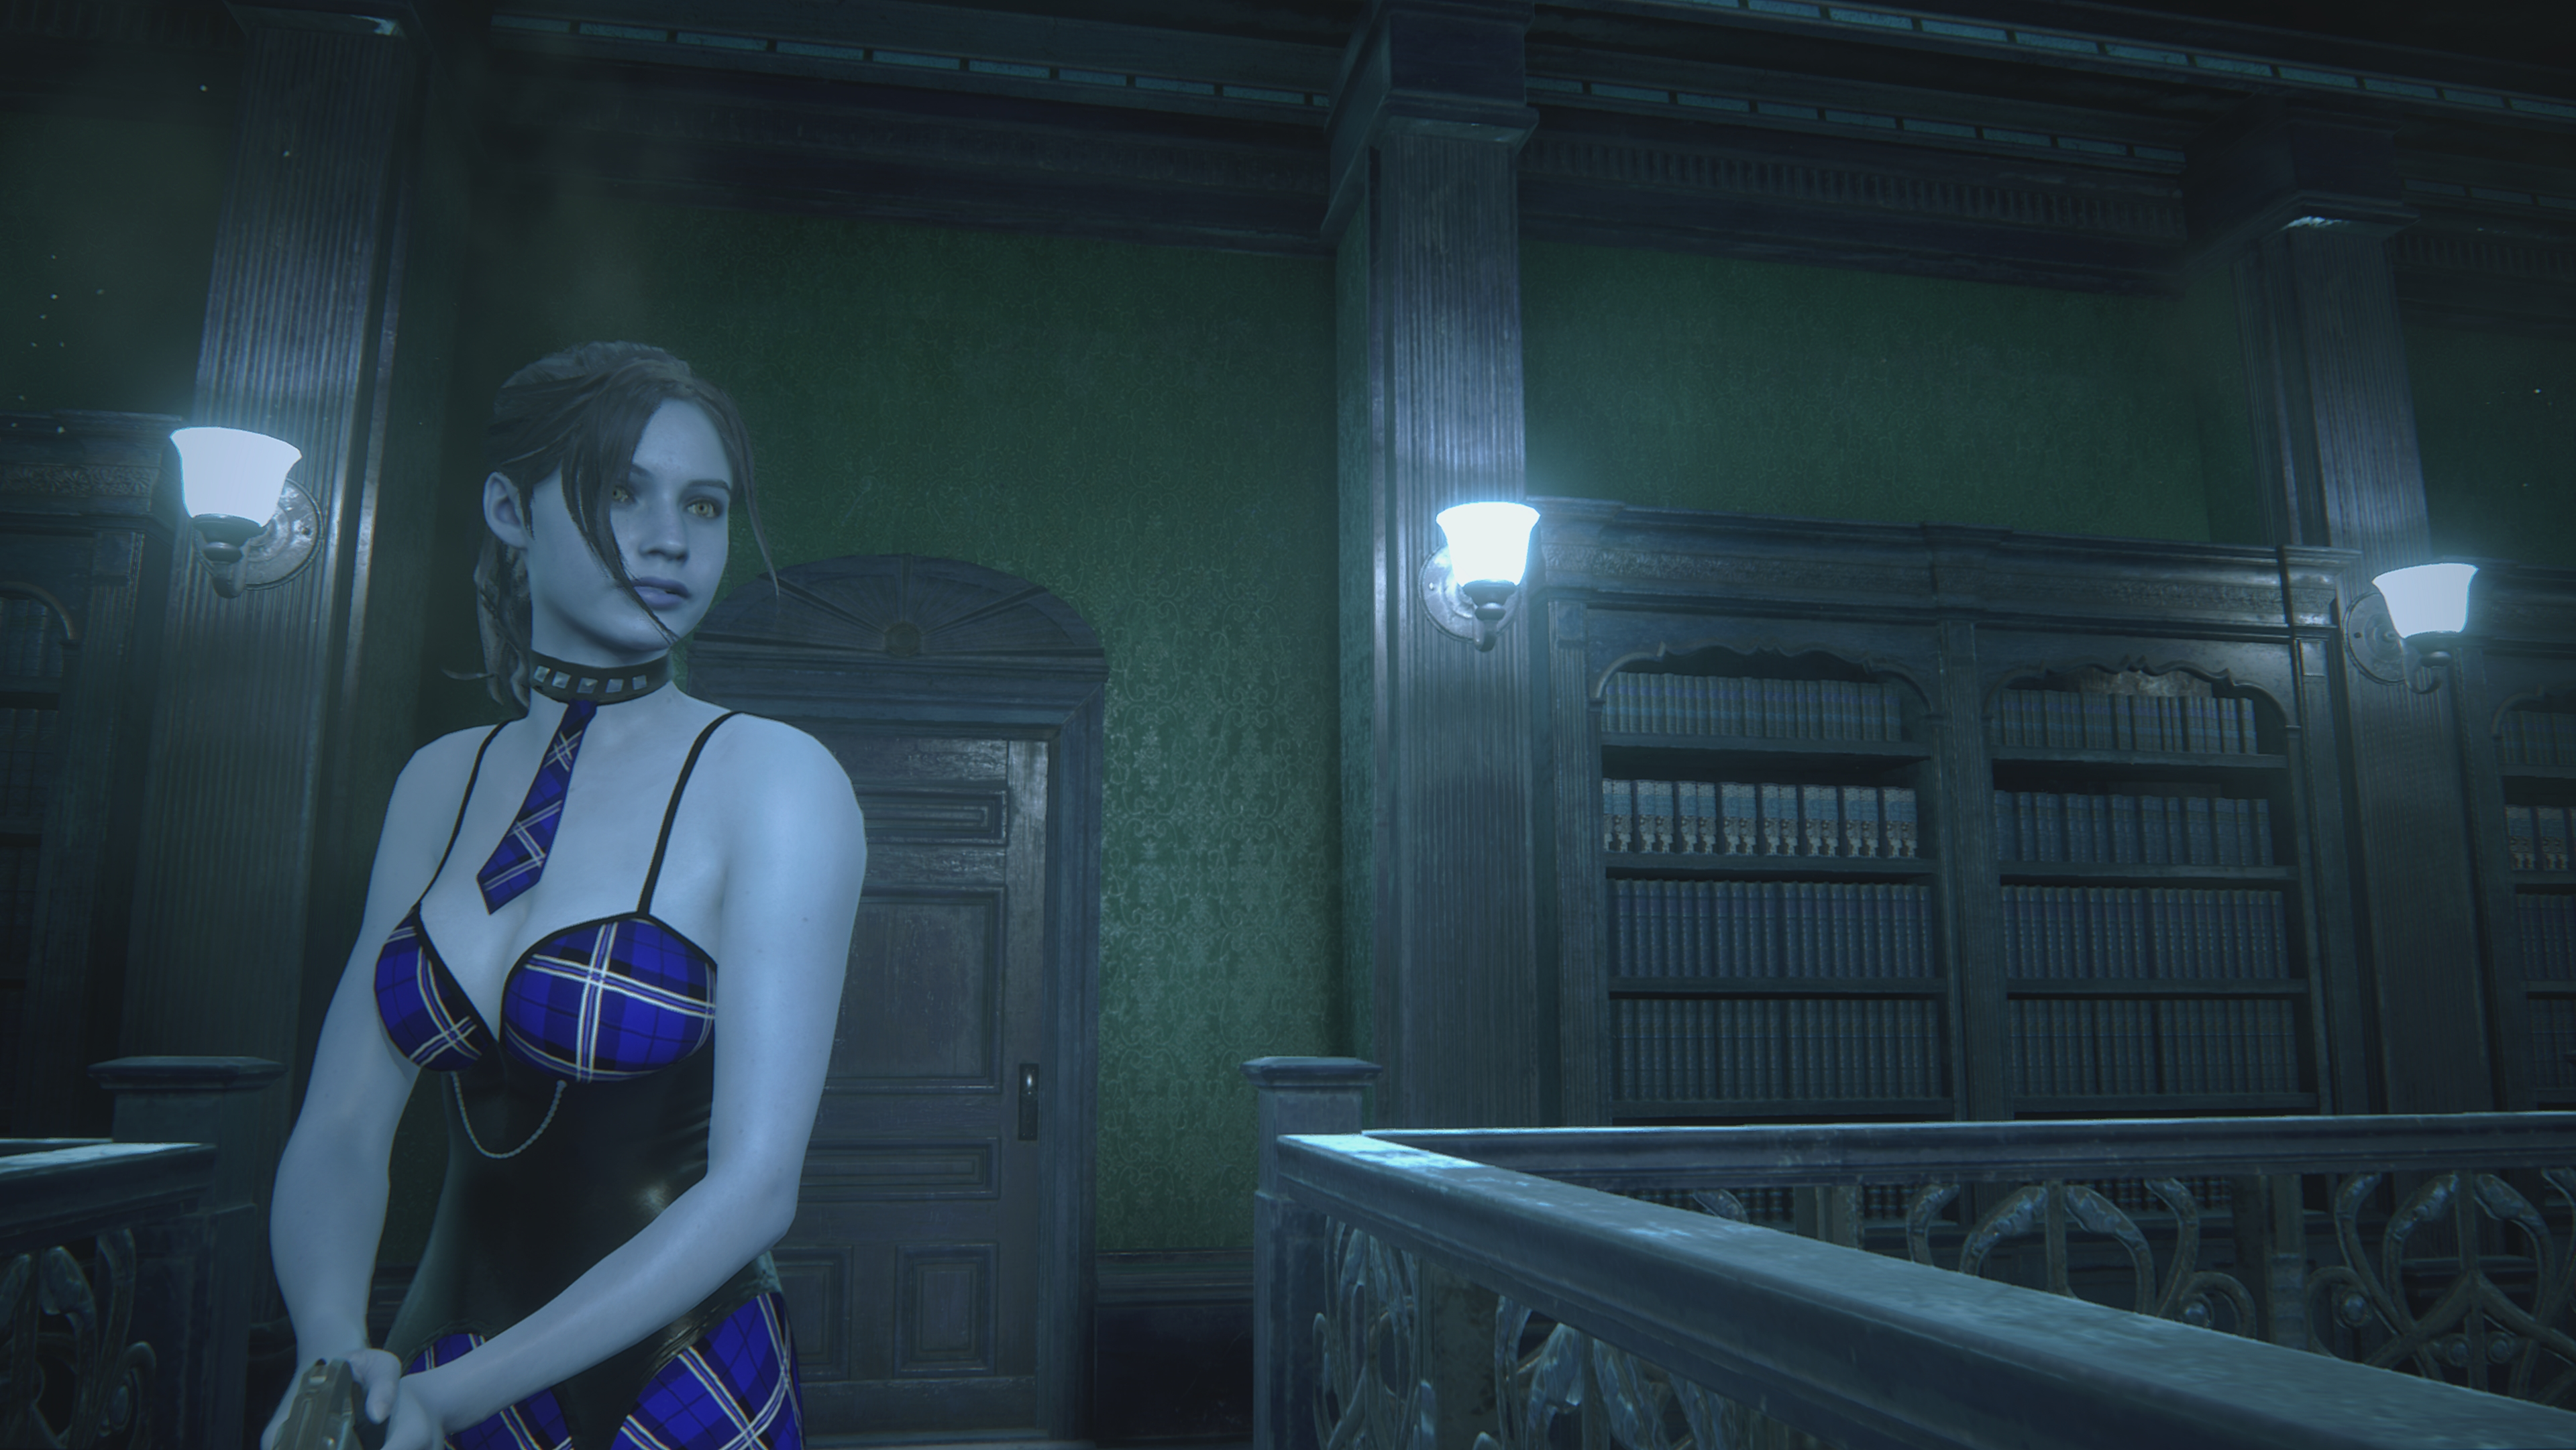 RESIDENT EVIL 2 / BIOHAZARD RE:2 Claire College girl mod - Resident Evil 2